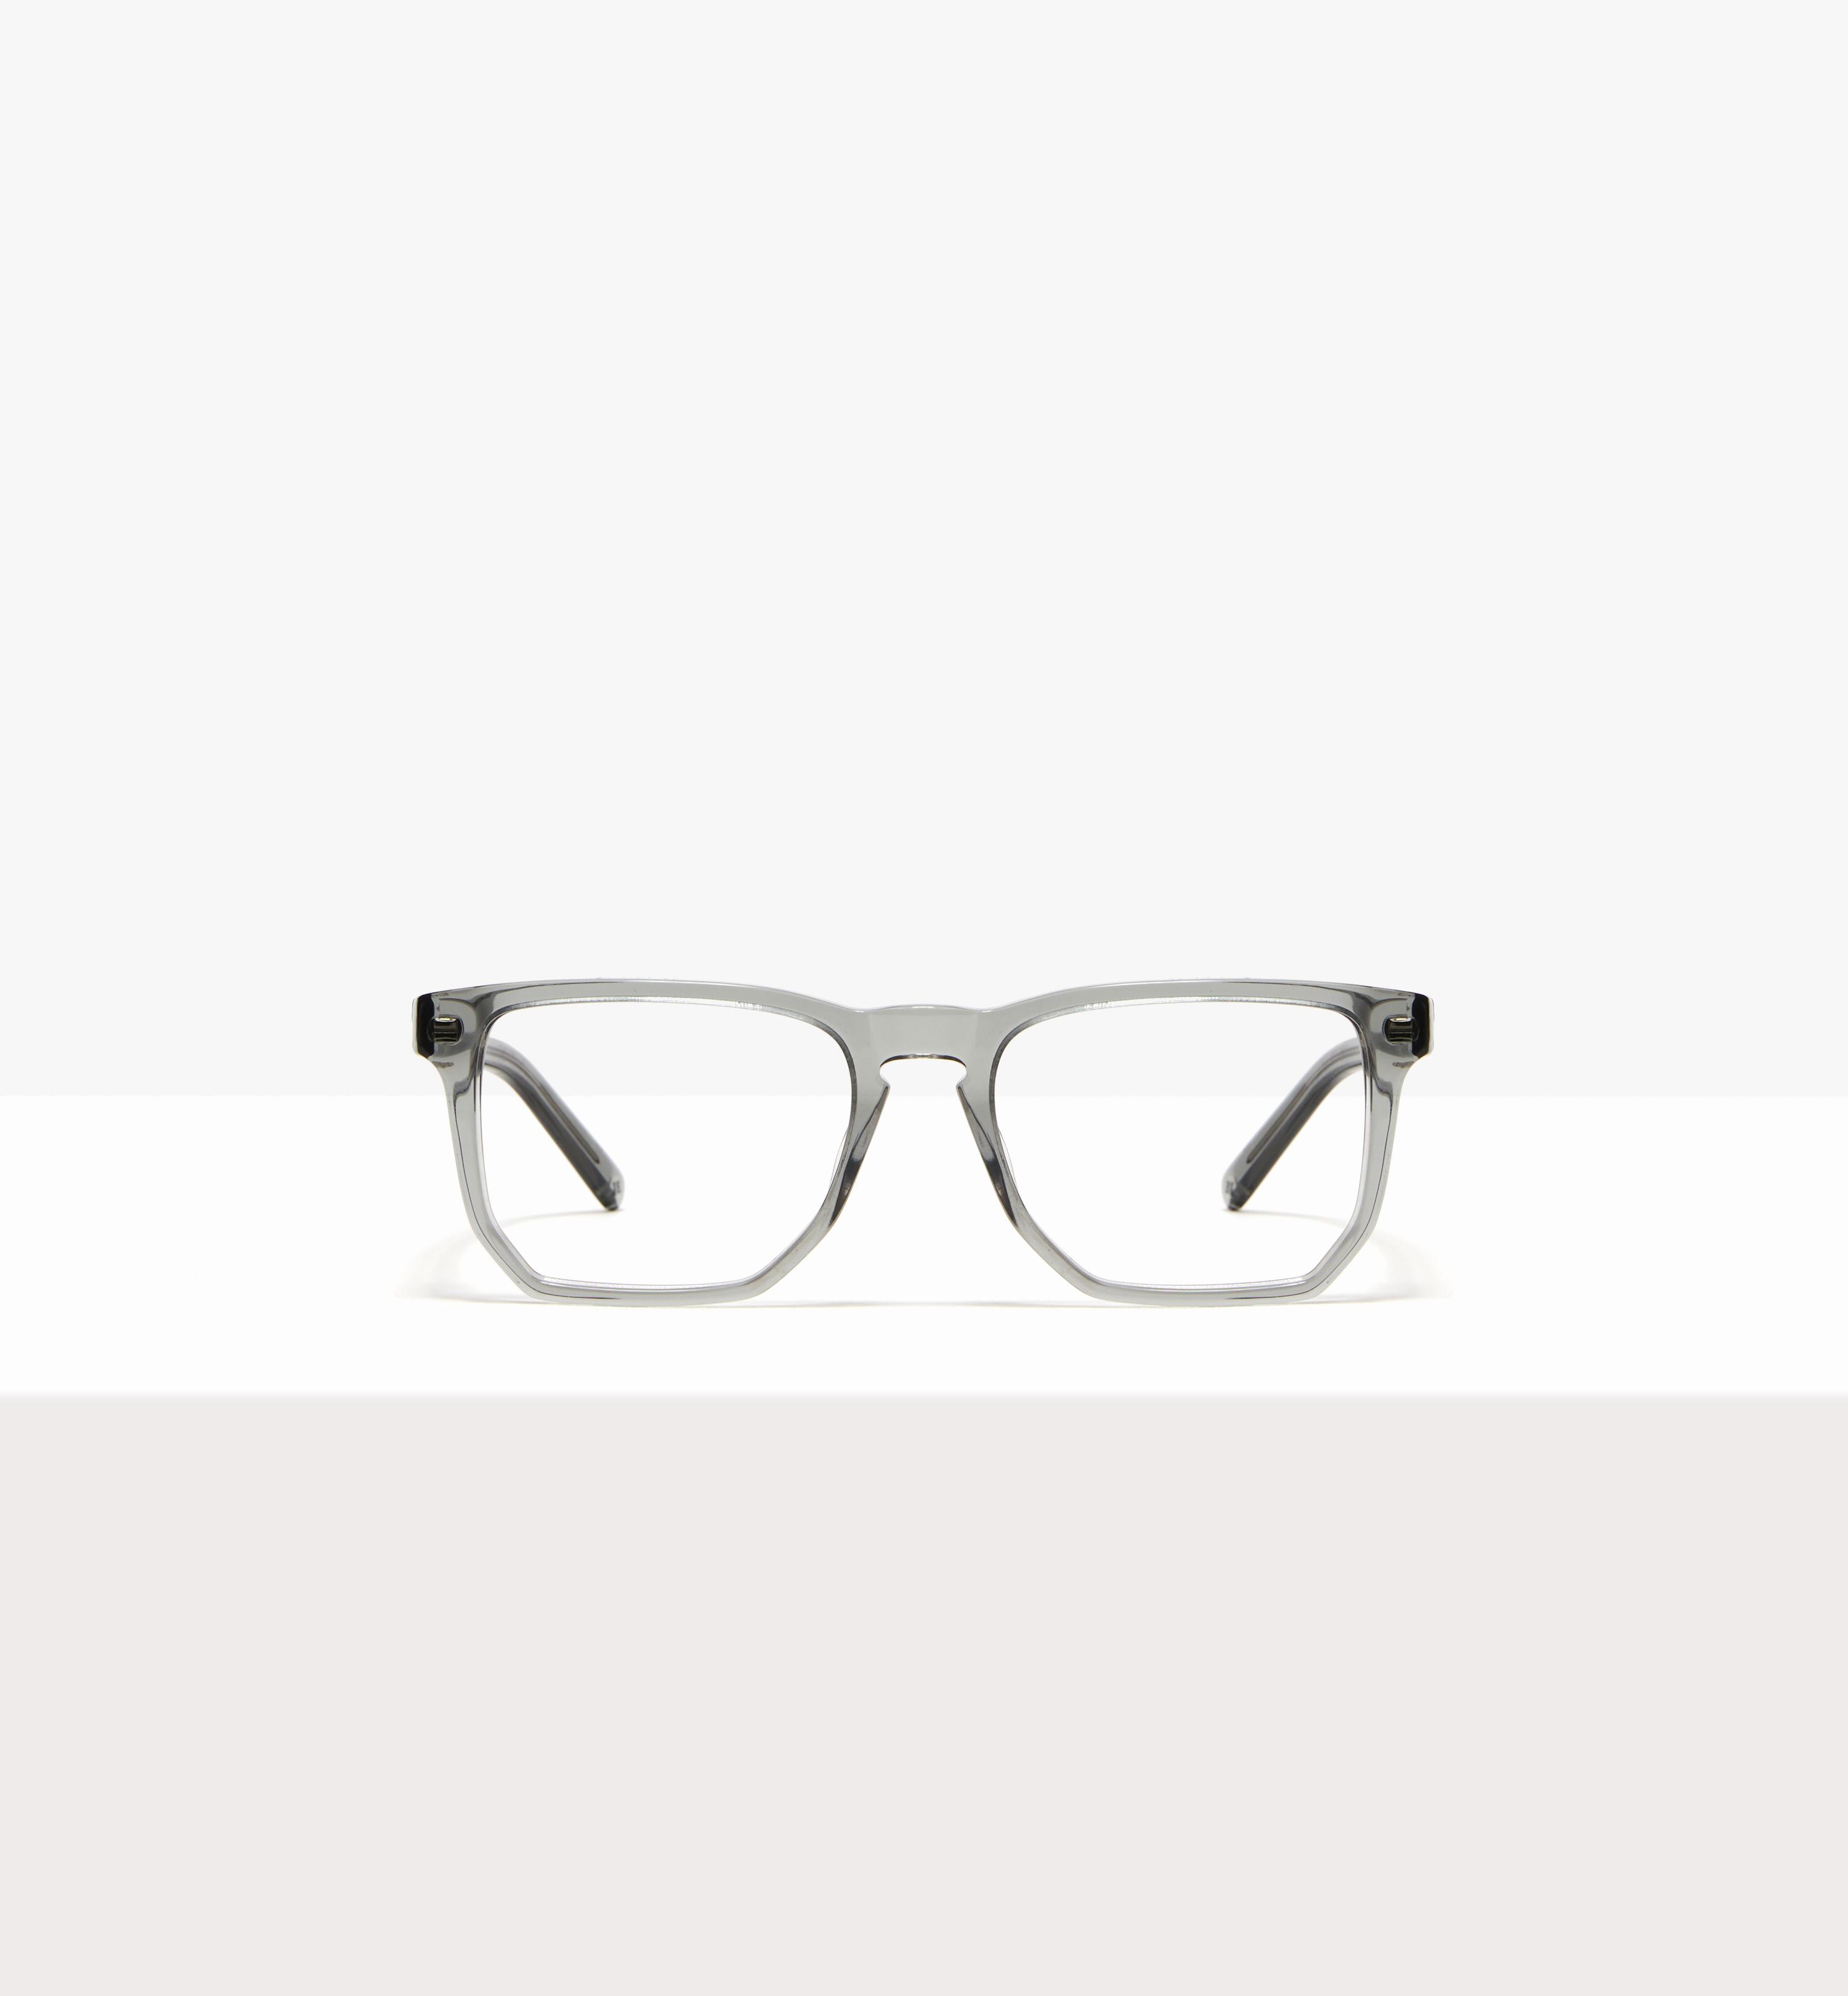 Tortoise High Fashion Runway Croped Exposed Lens Cat Eye Glasses